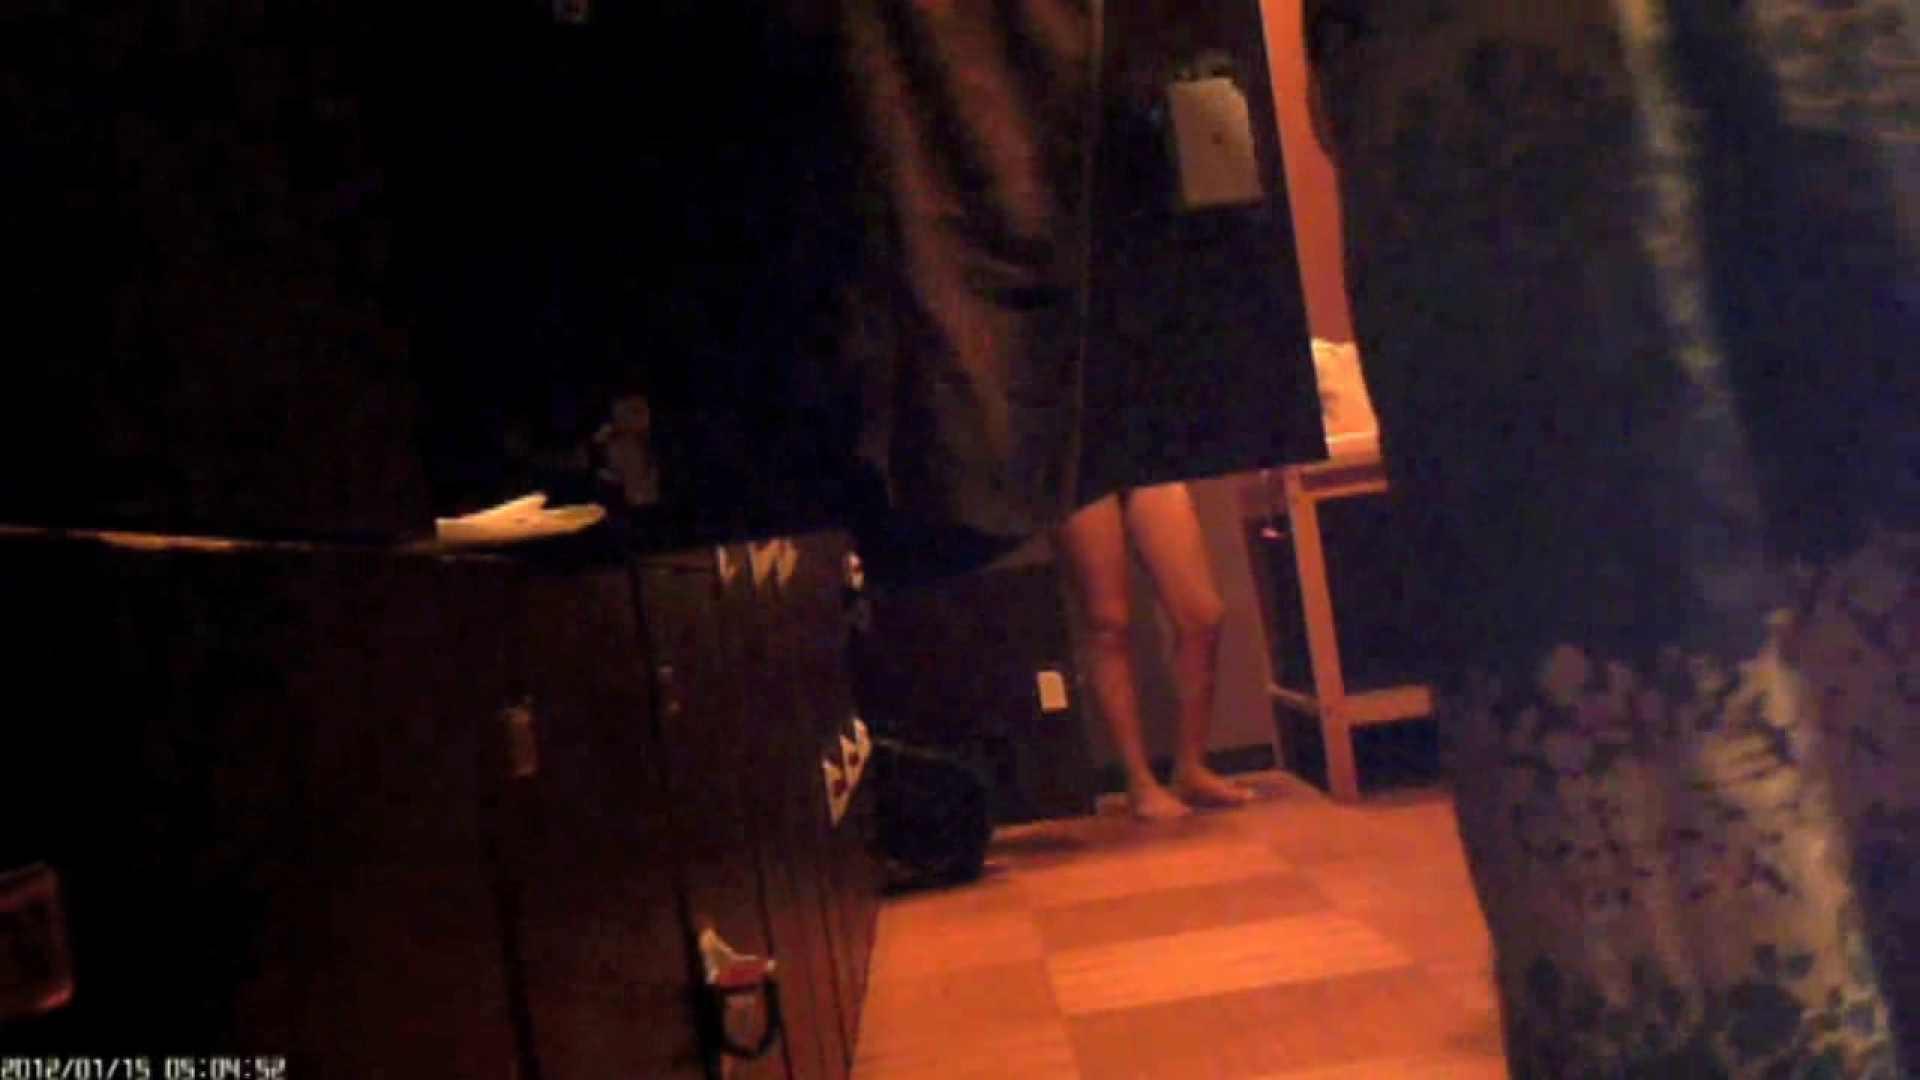 現役ギャル盗撮師 hana様の女風呂潜入撮!Vol.4 潜入 戯れ無修正画像 42連発 32